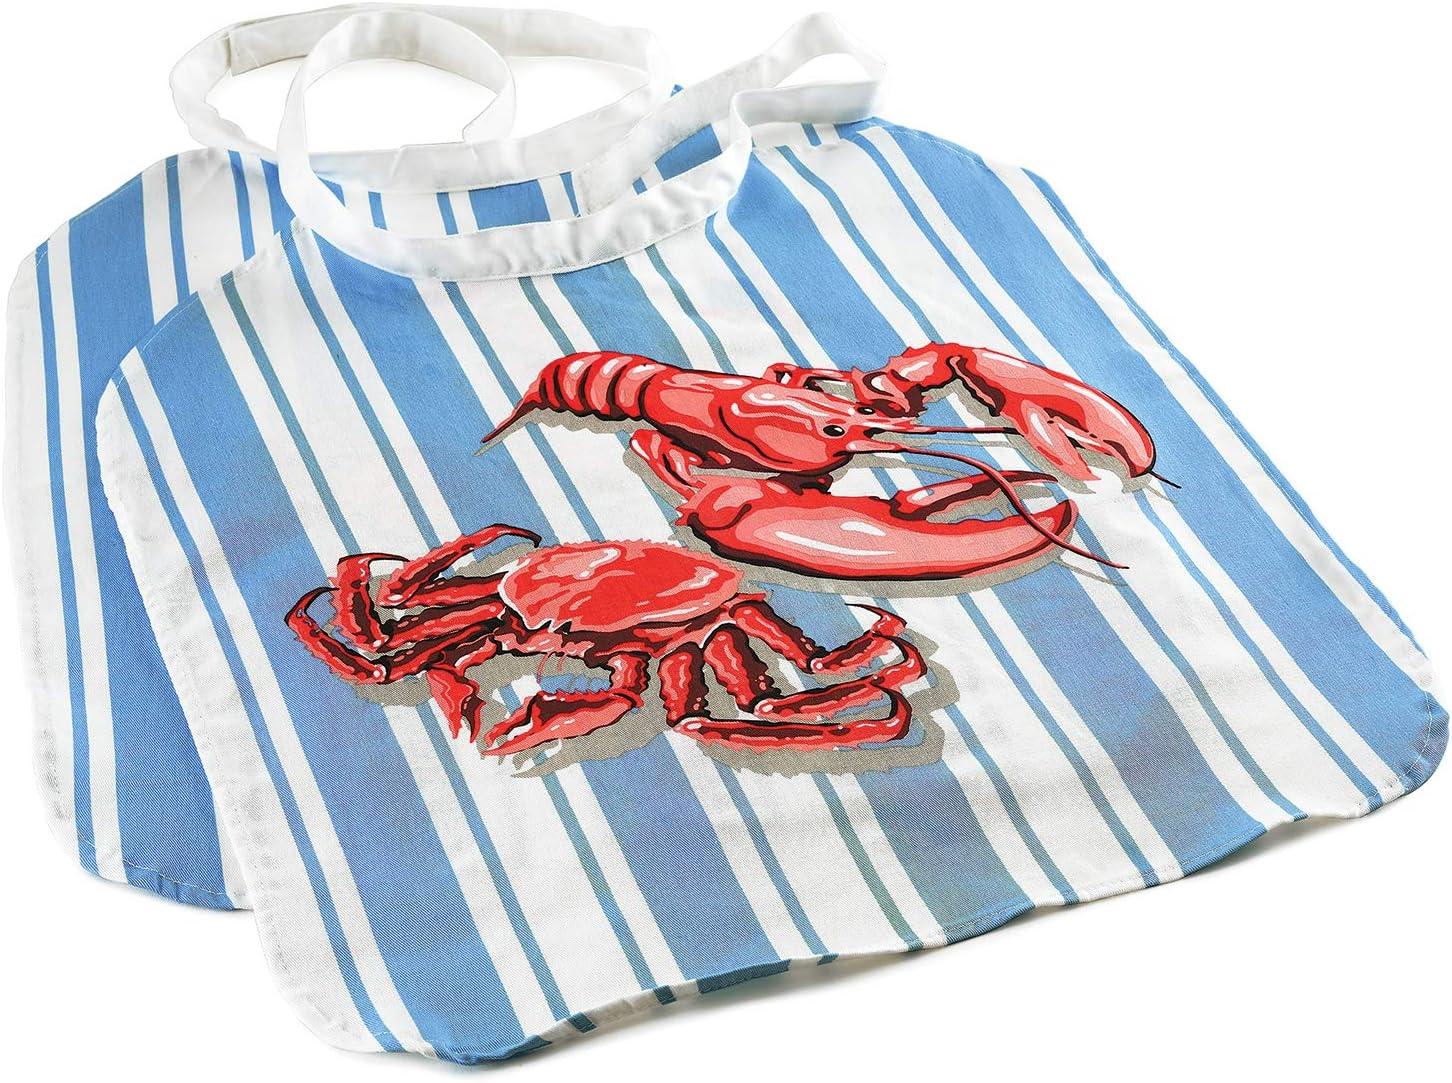 Norpro Seafood Bib, One-Size (Set of 2), Blue/Red